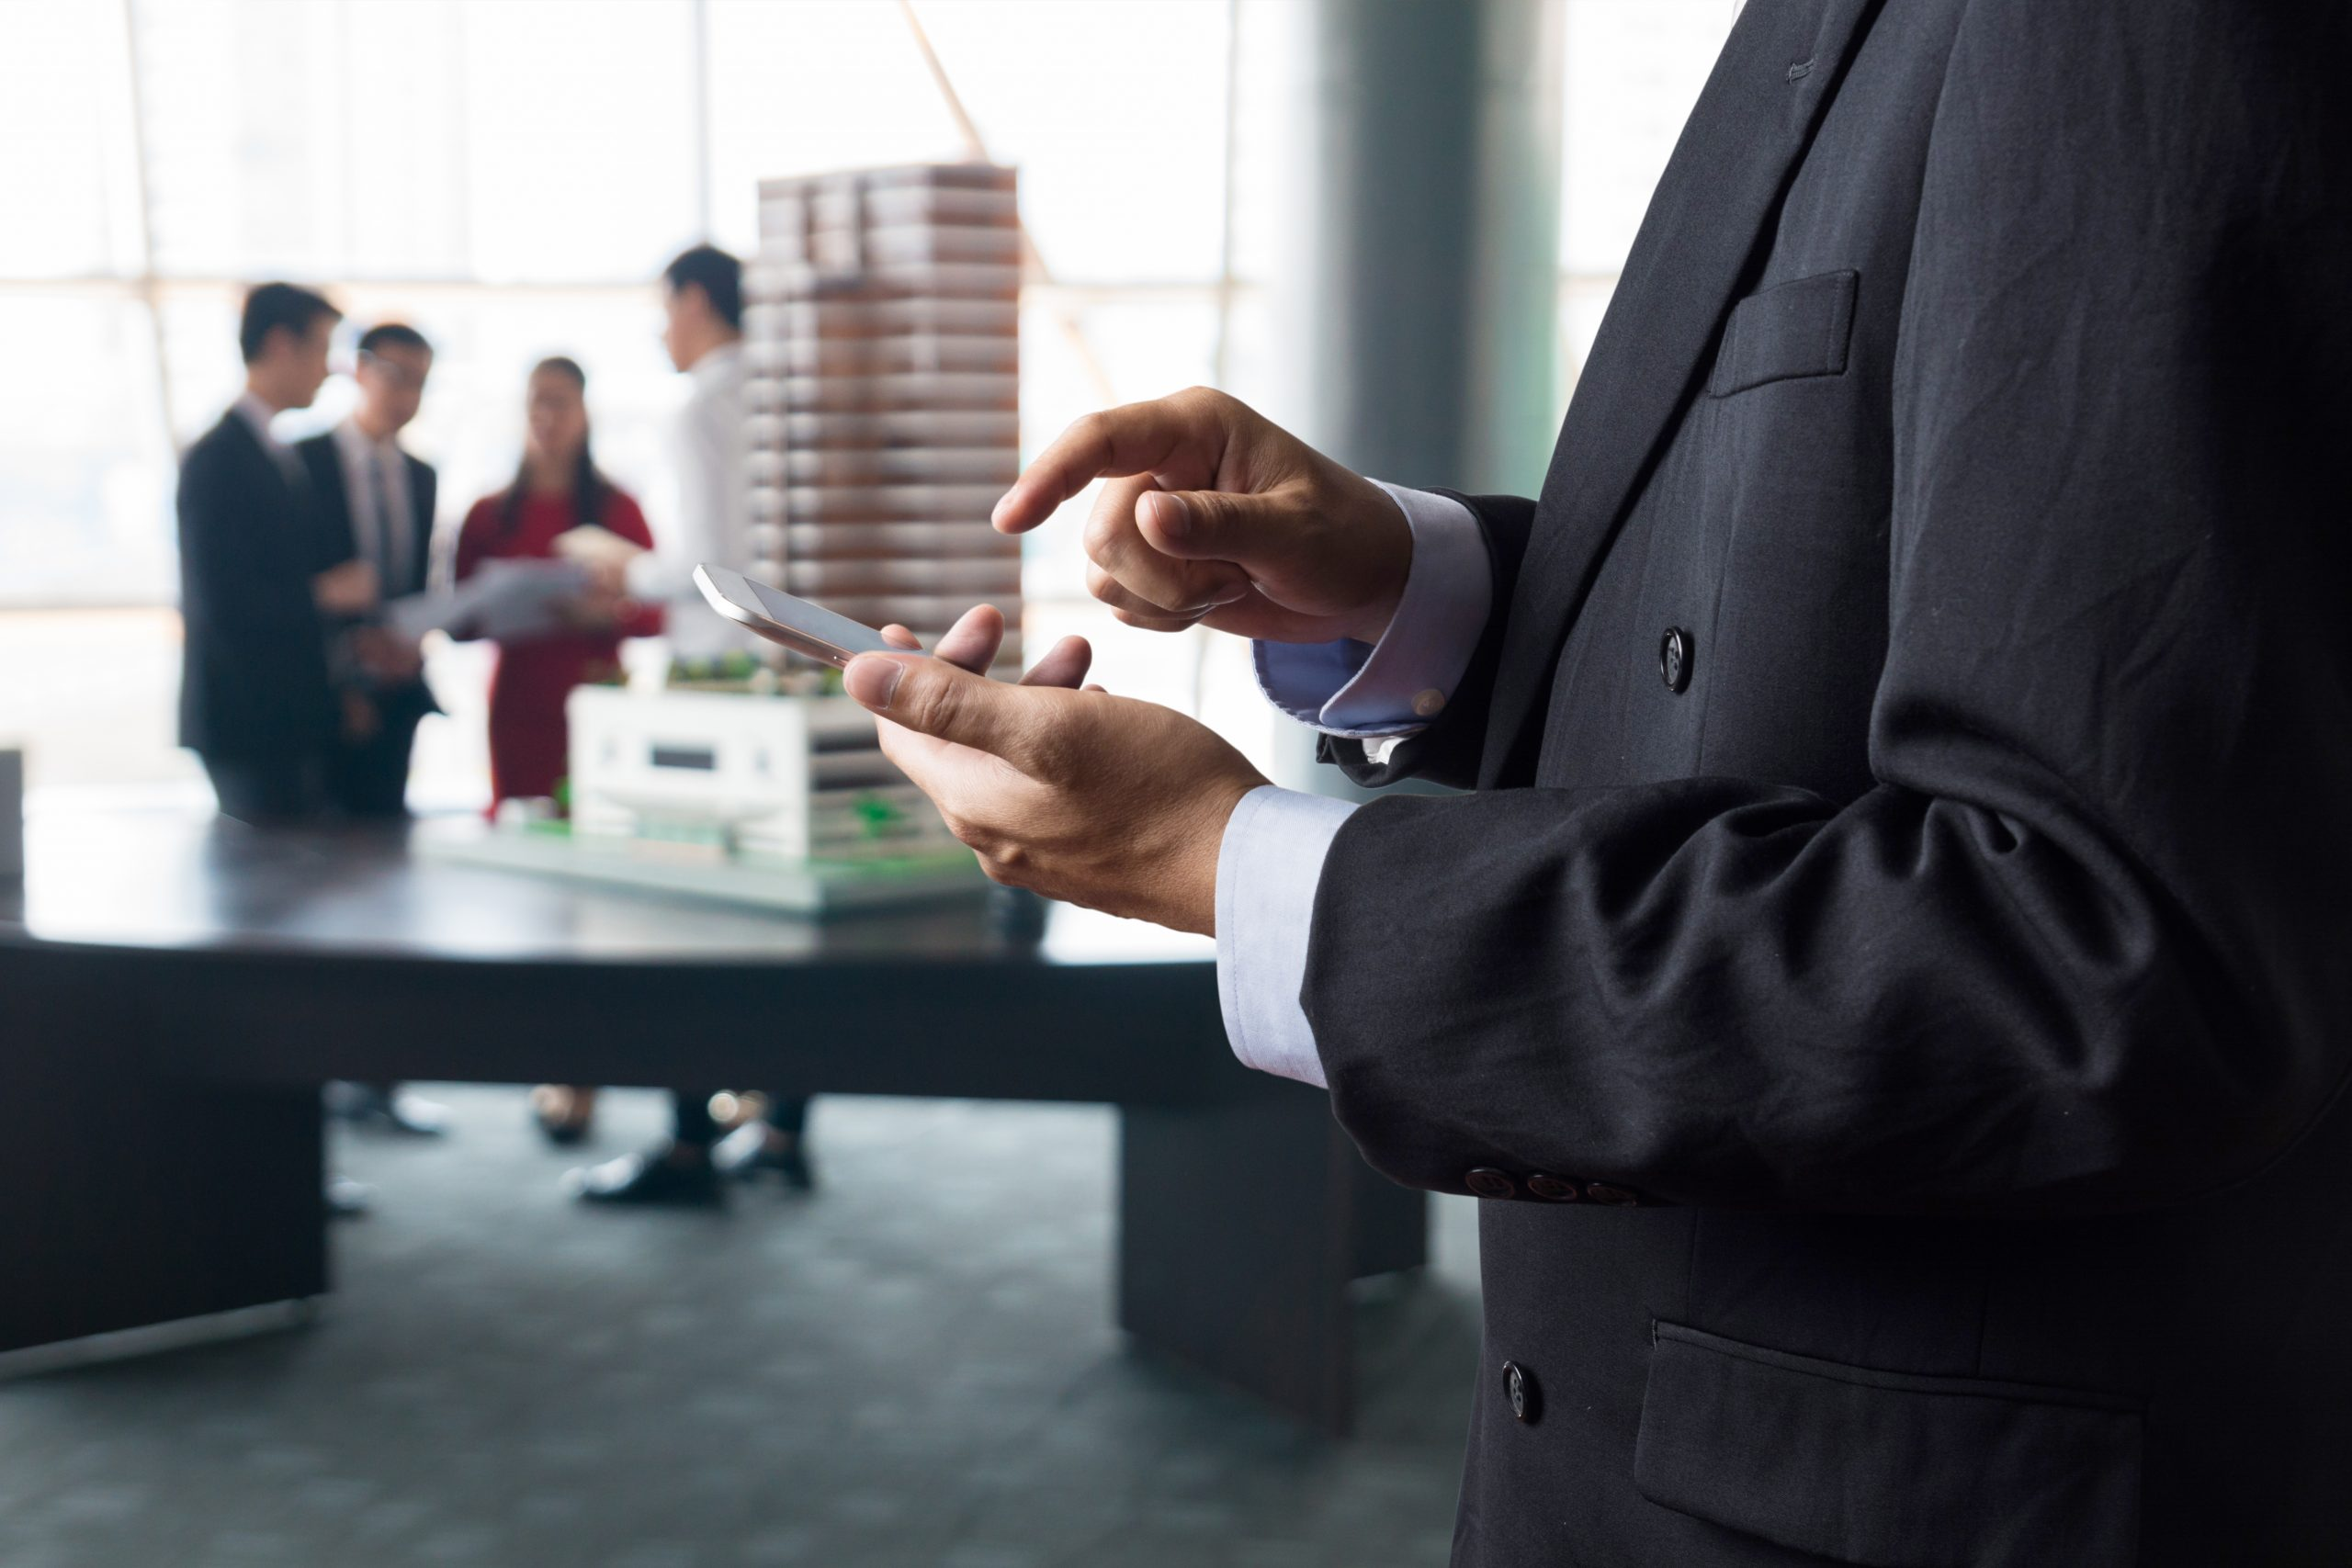 Redes sociais para advogados: o que fazer para se destacar?